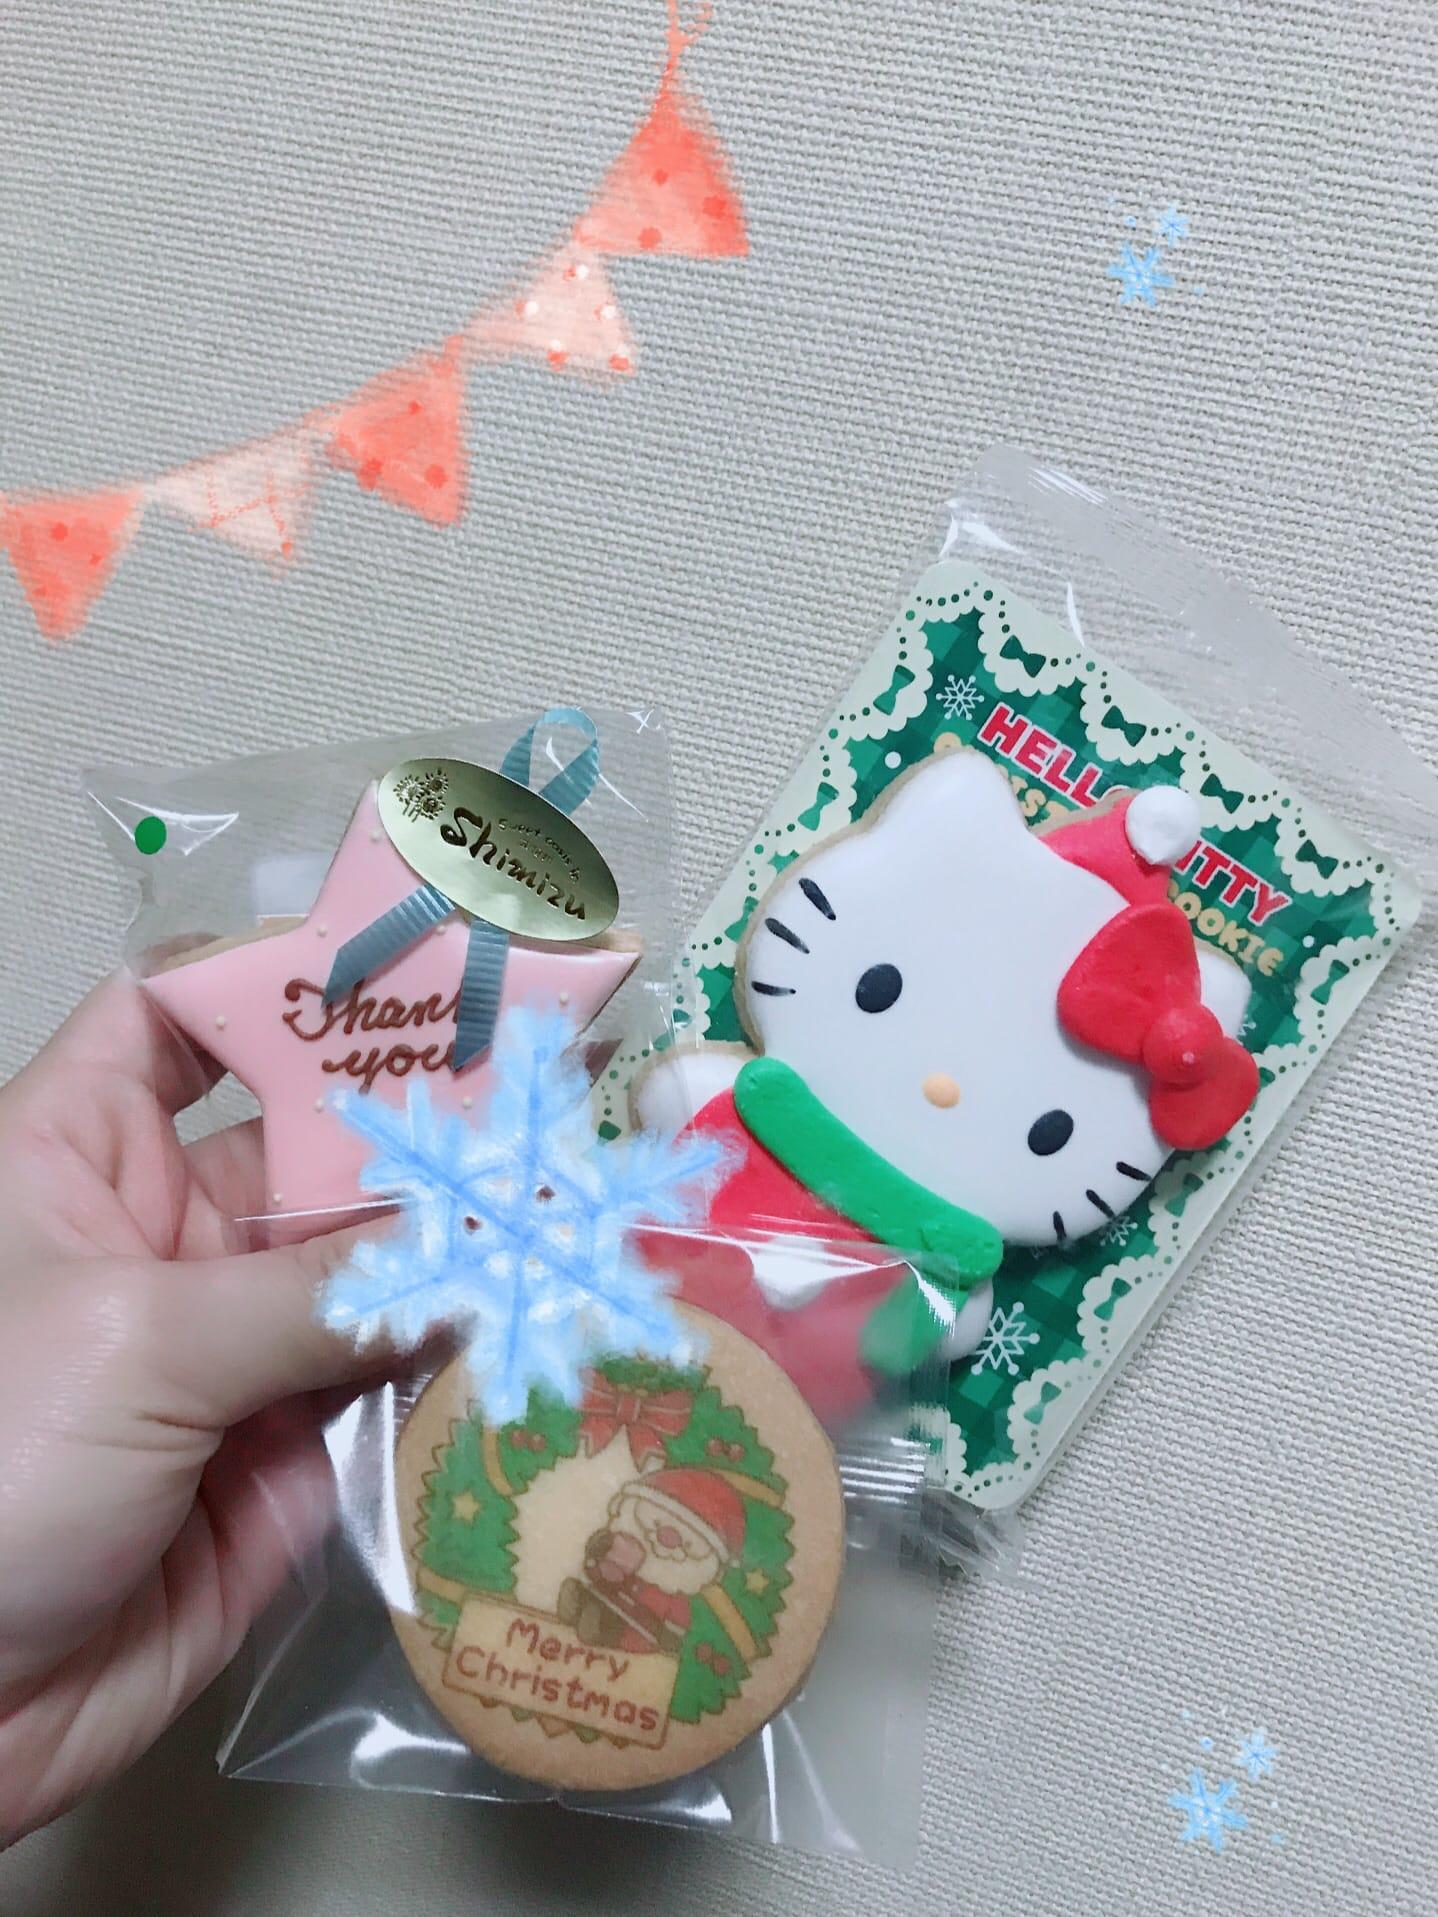 「(?´-д-)?o○Zzz」12/11(12/11) 03:53 | れみの写メ・風俗動画